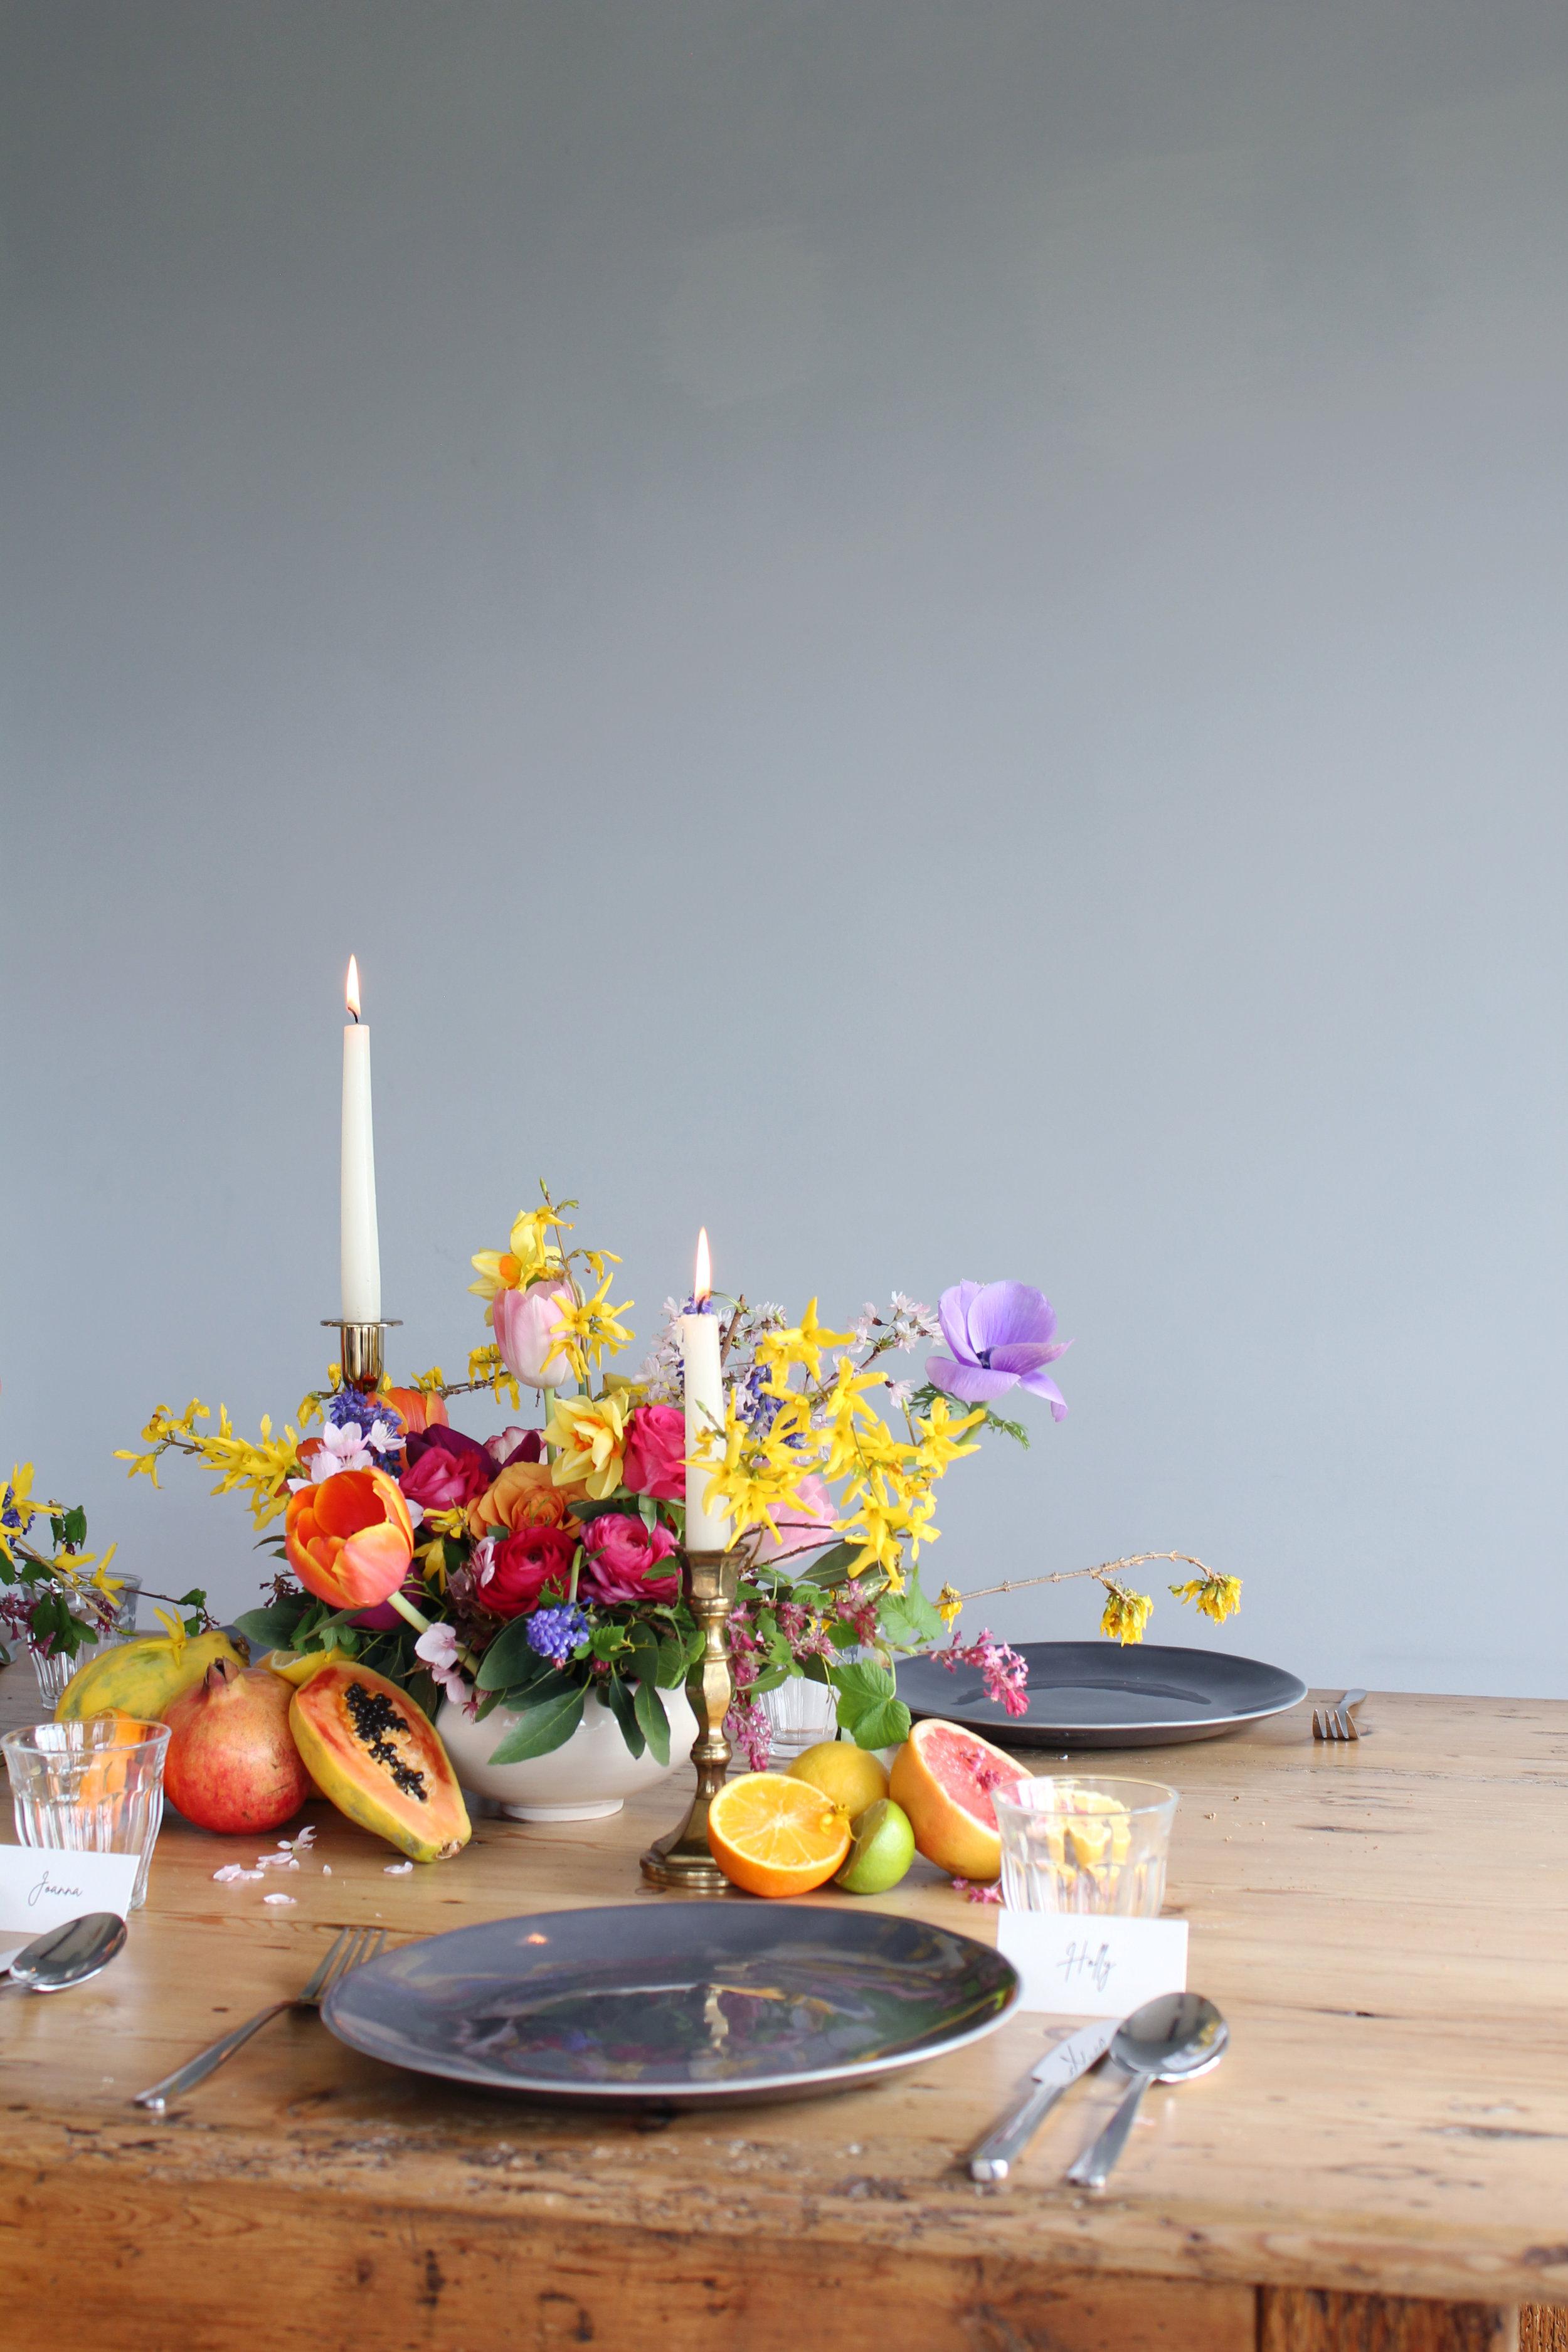 Callie-Pettigrew-Fruity-Florals-23.jpg